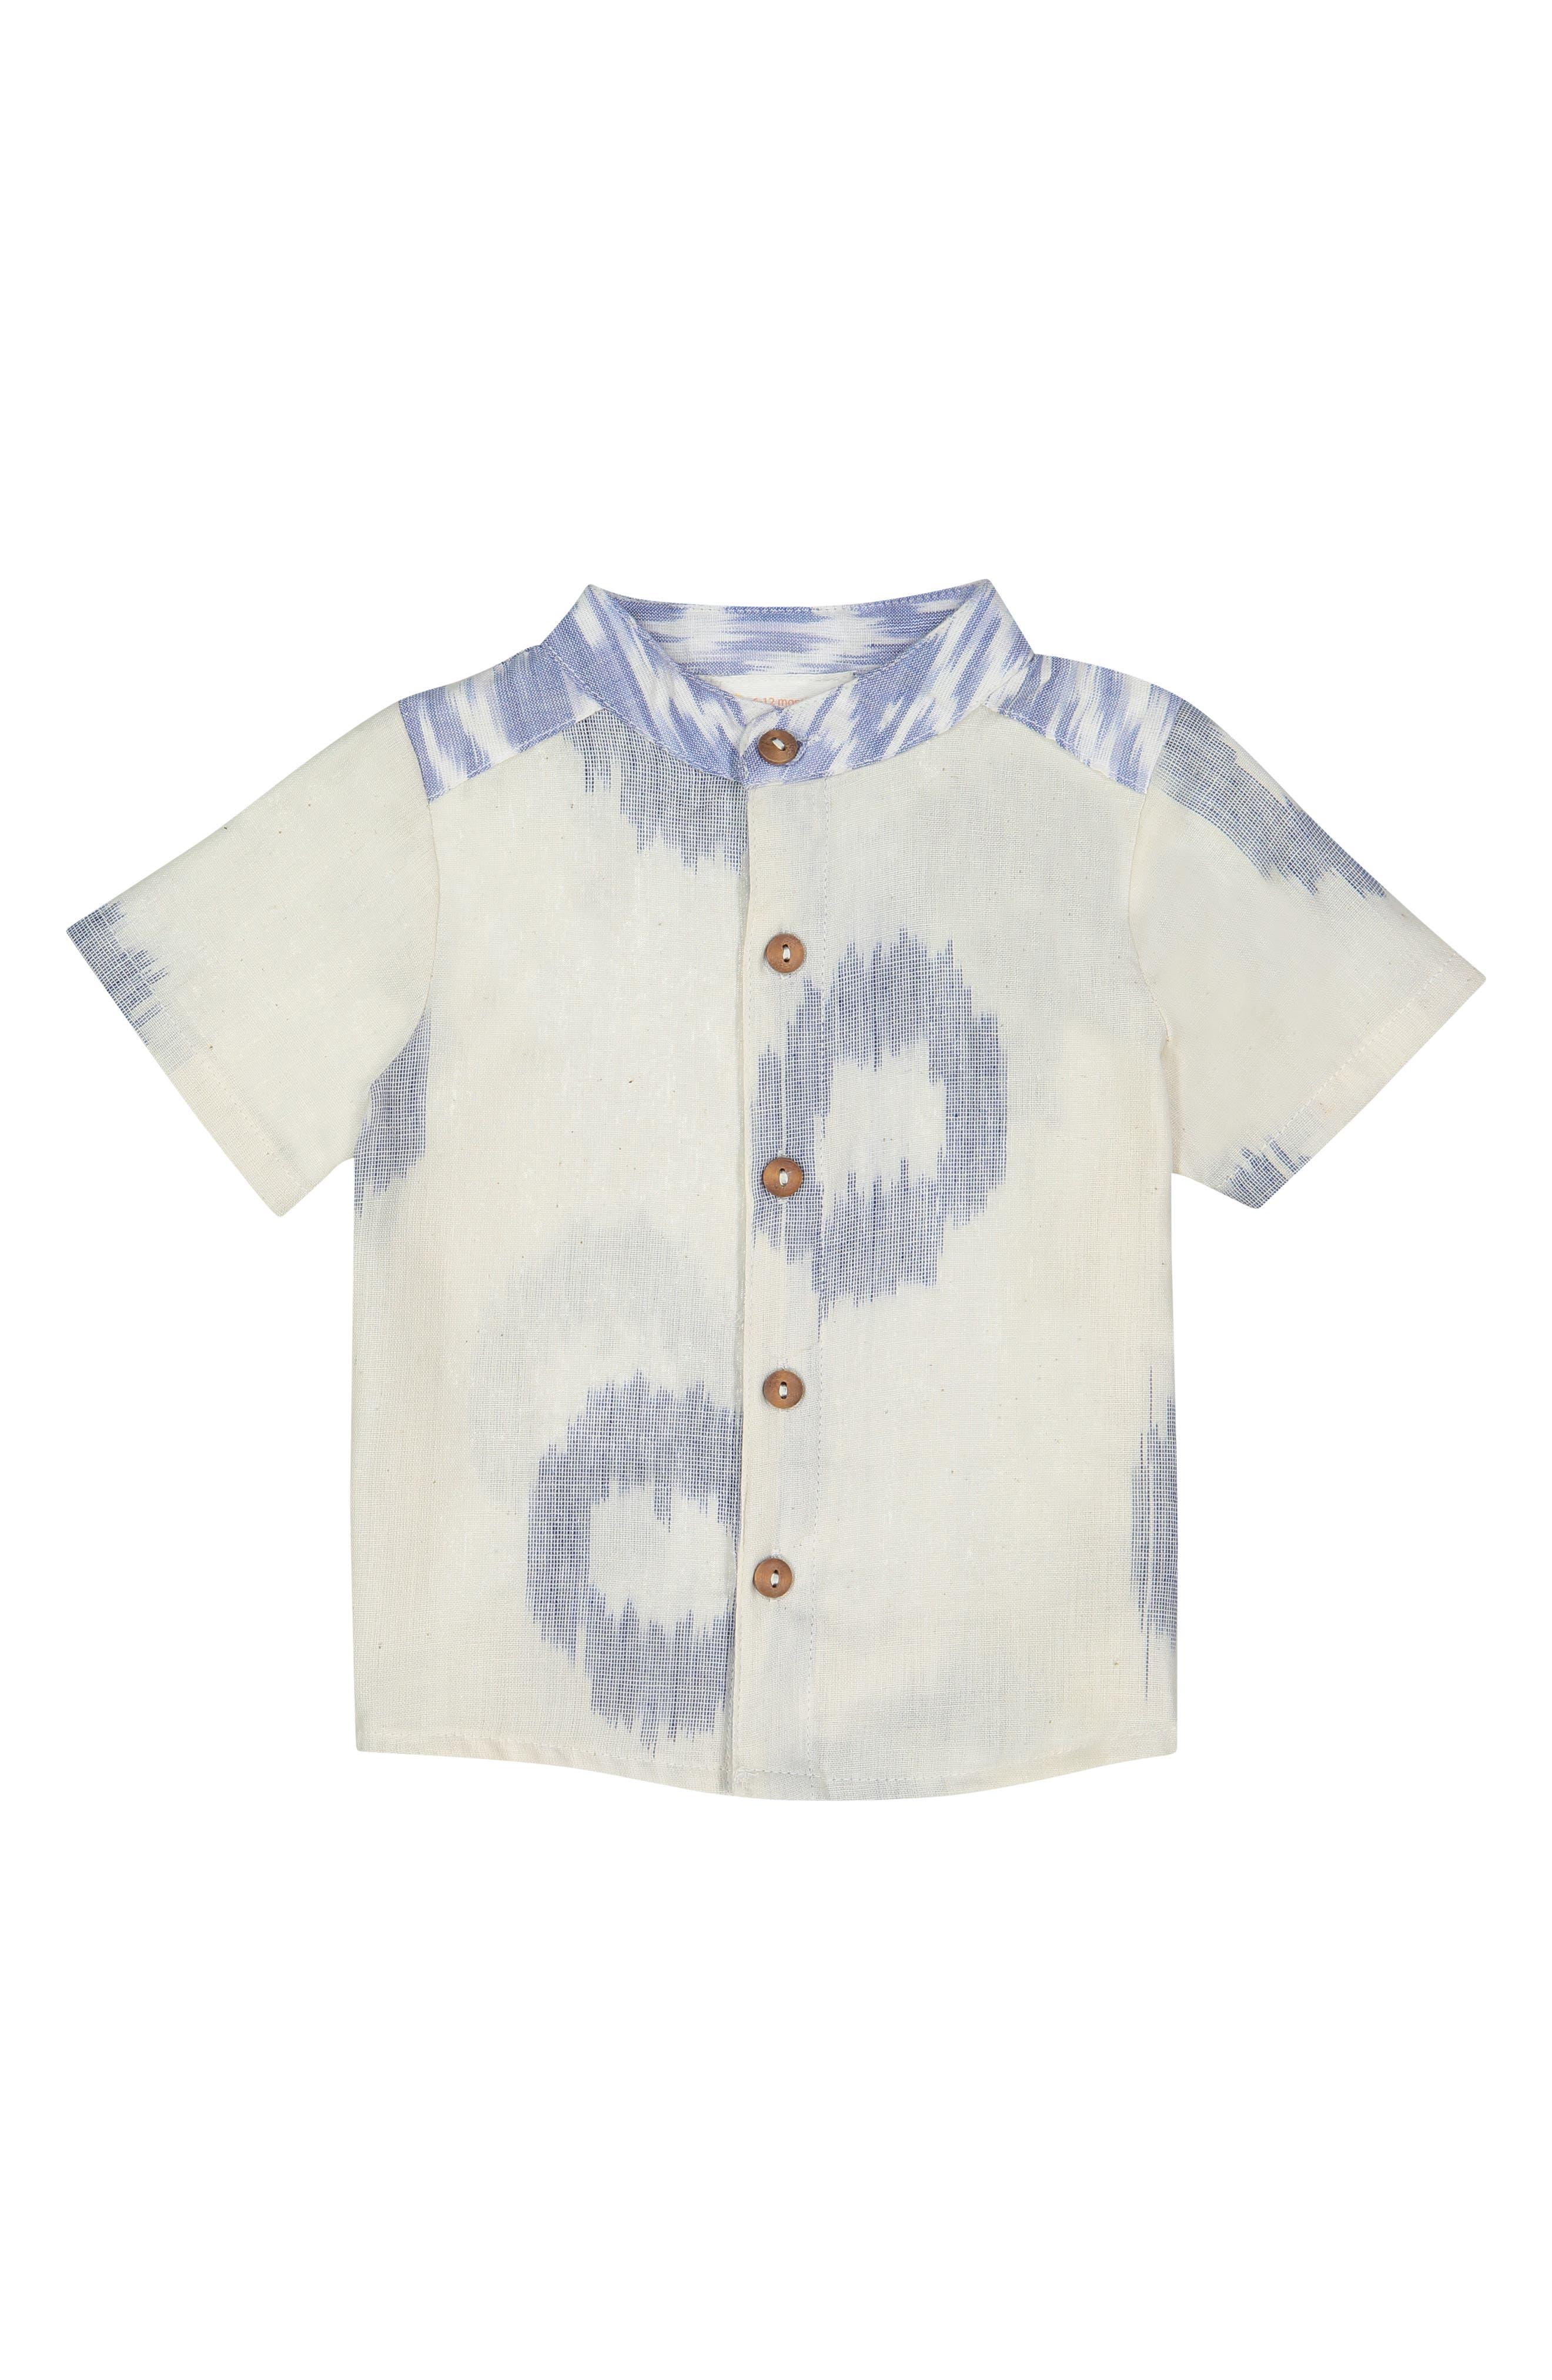 Wilder Ikat Dots Shirt,                             Main thumbnail 1, color,                             BLUE